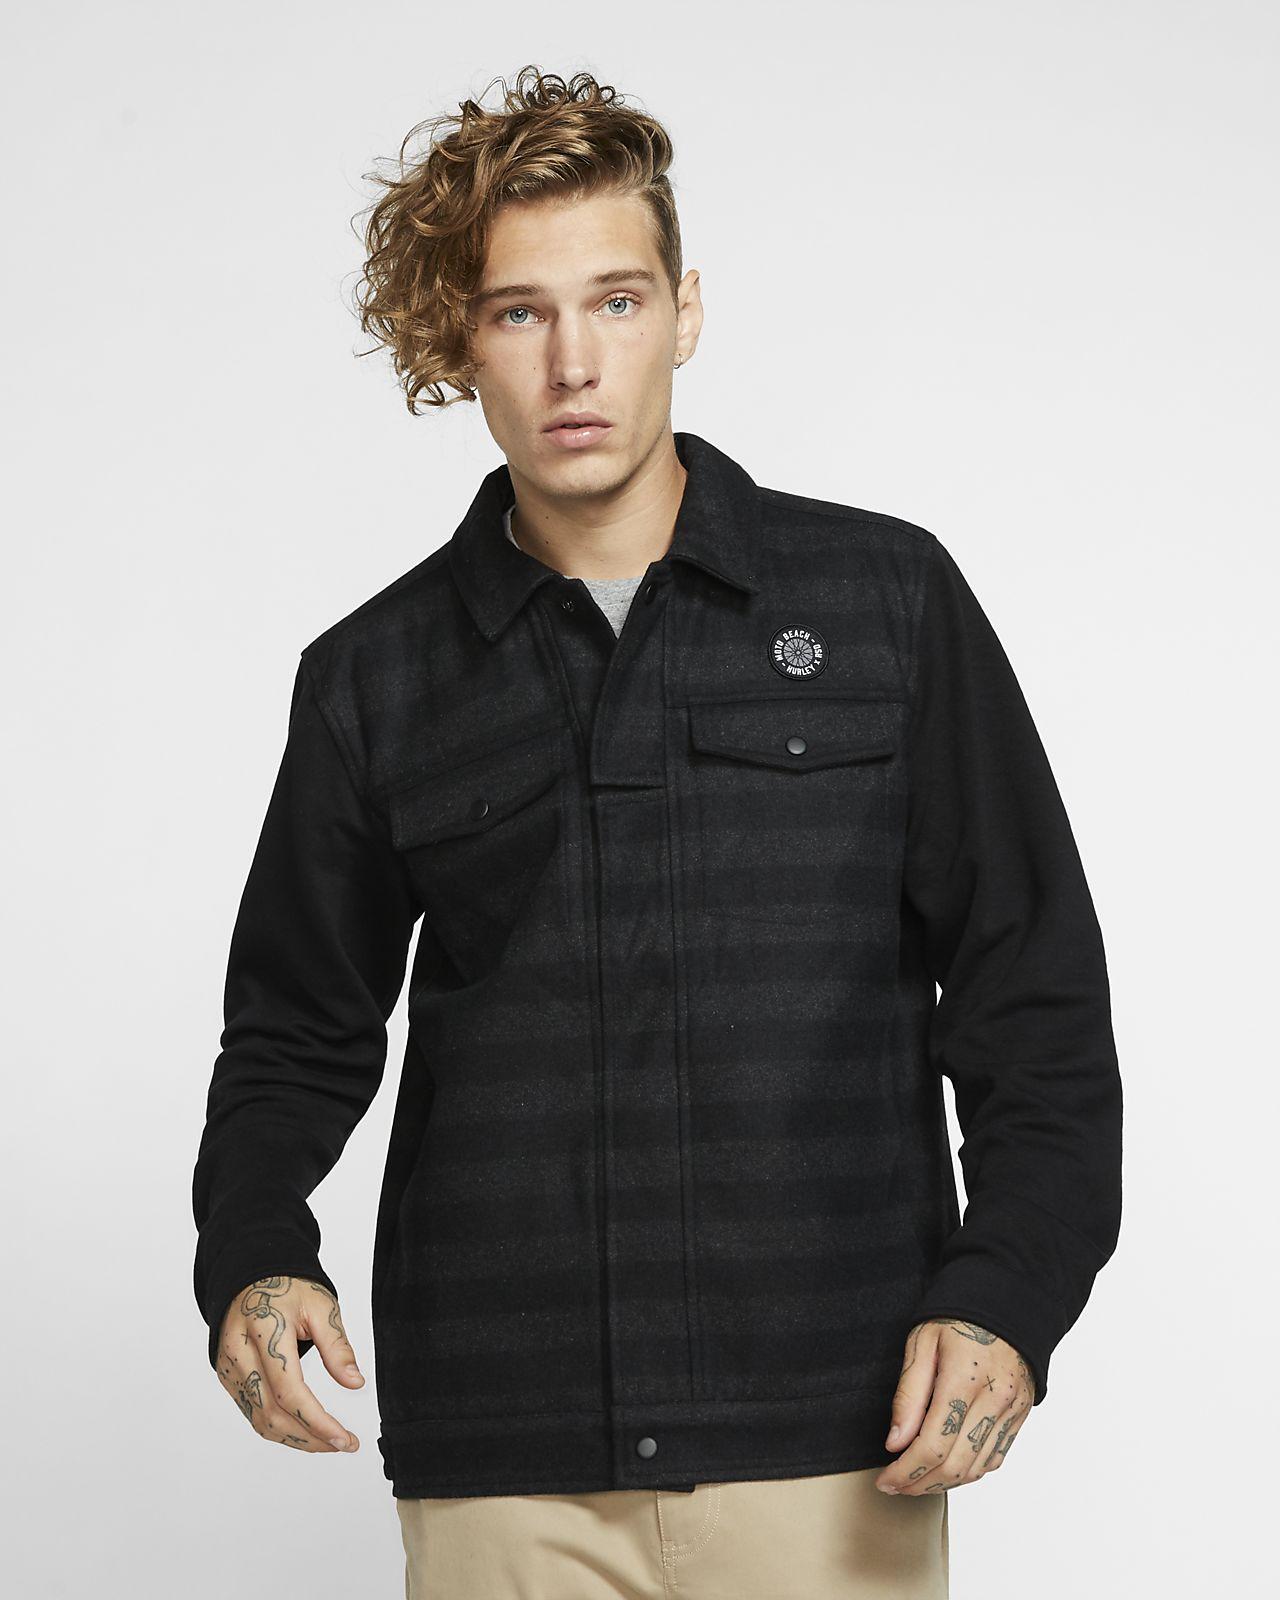 Hurley x Roland Sands Trucker Hybrid Men's Jacket